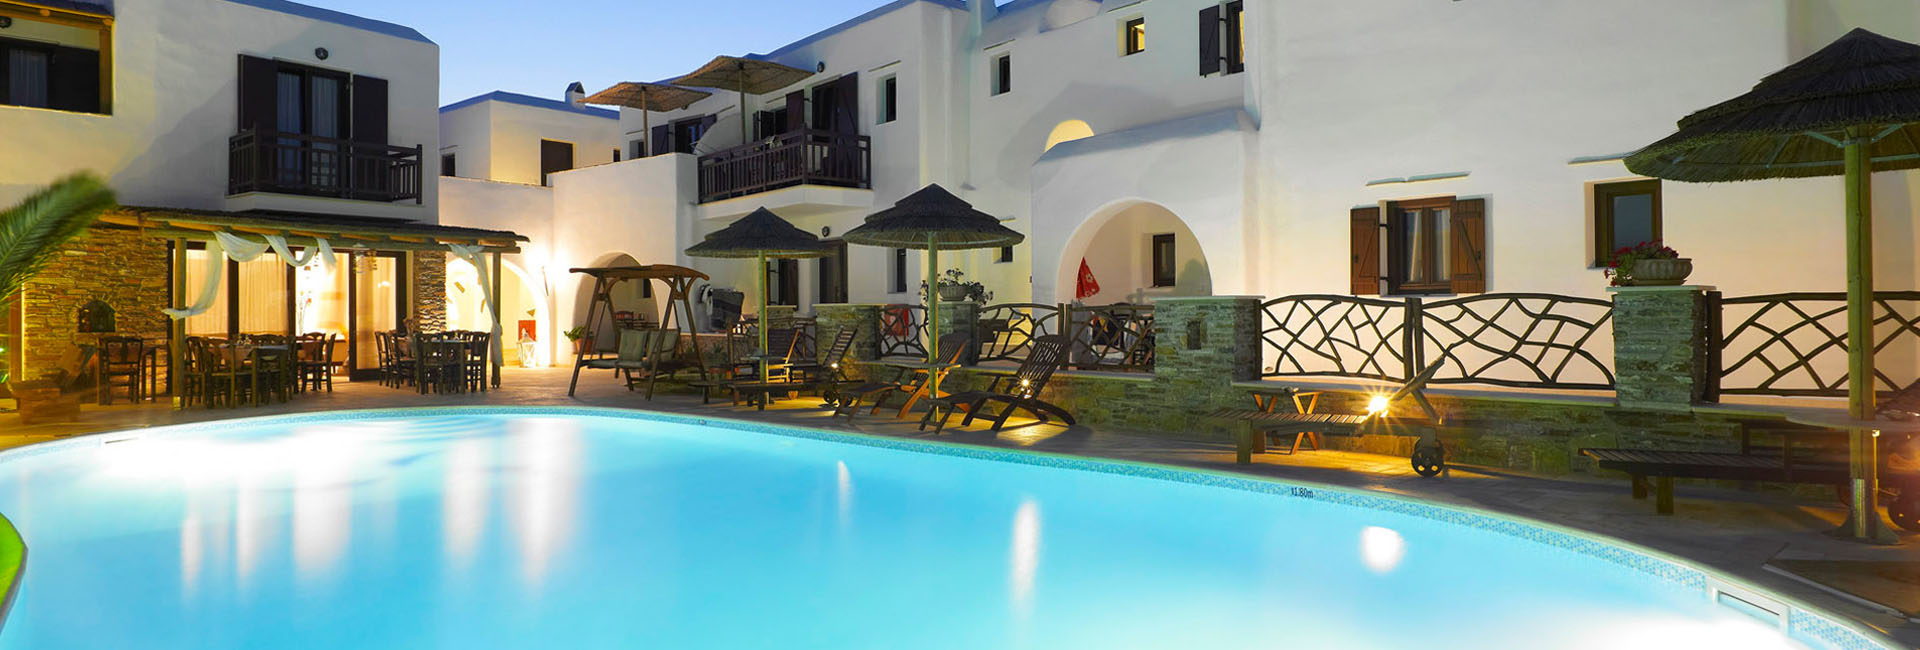 Hotel Anemomilos Naxos - swimming pool